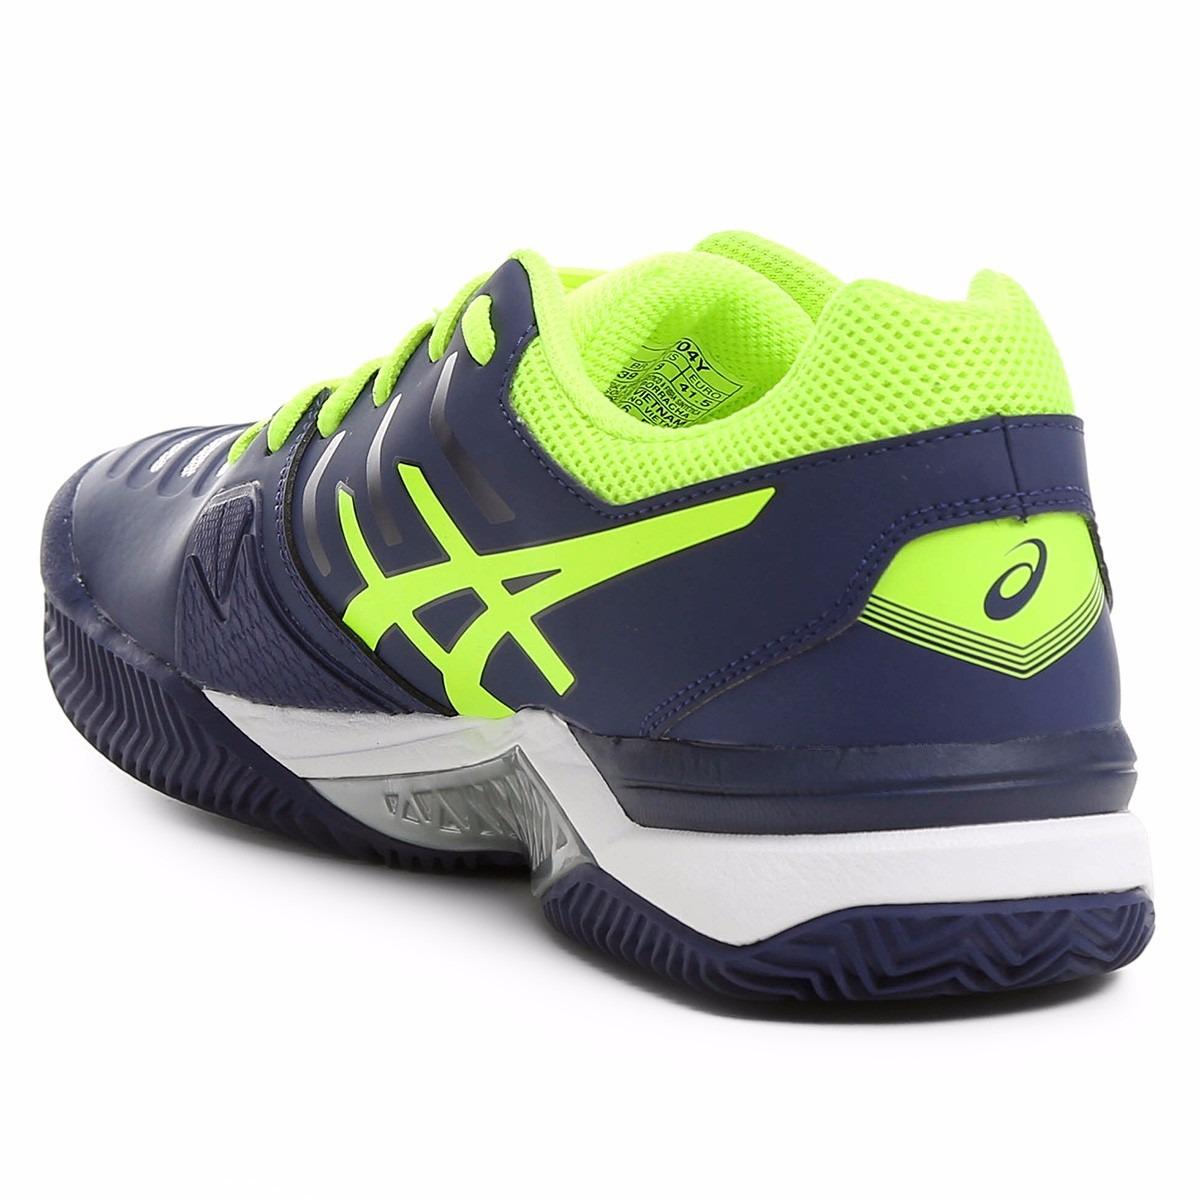 tênis asics gel challenger 11 clay. Carregando zoom. 644e93b681b57